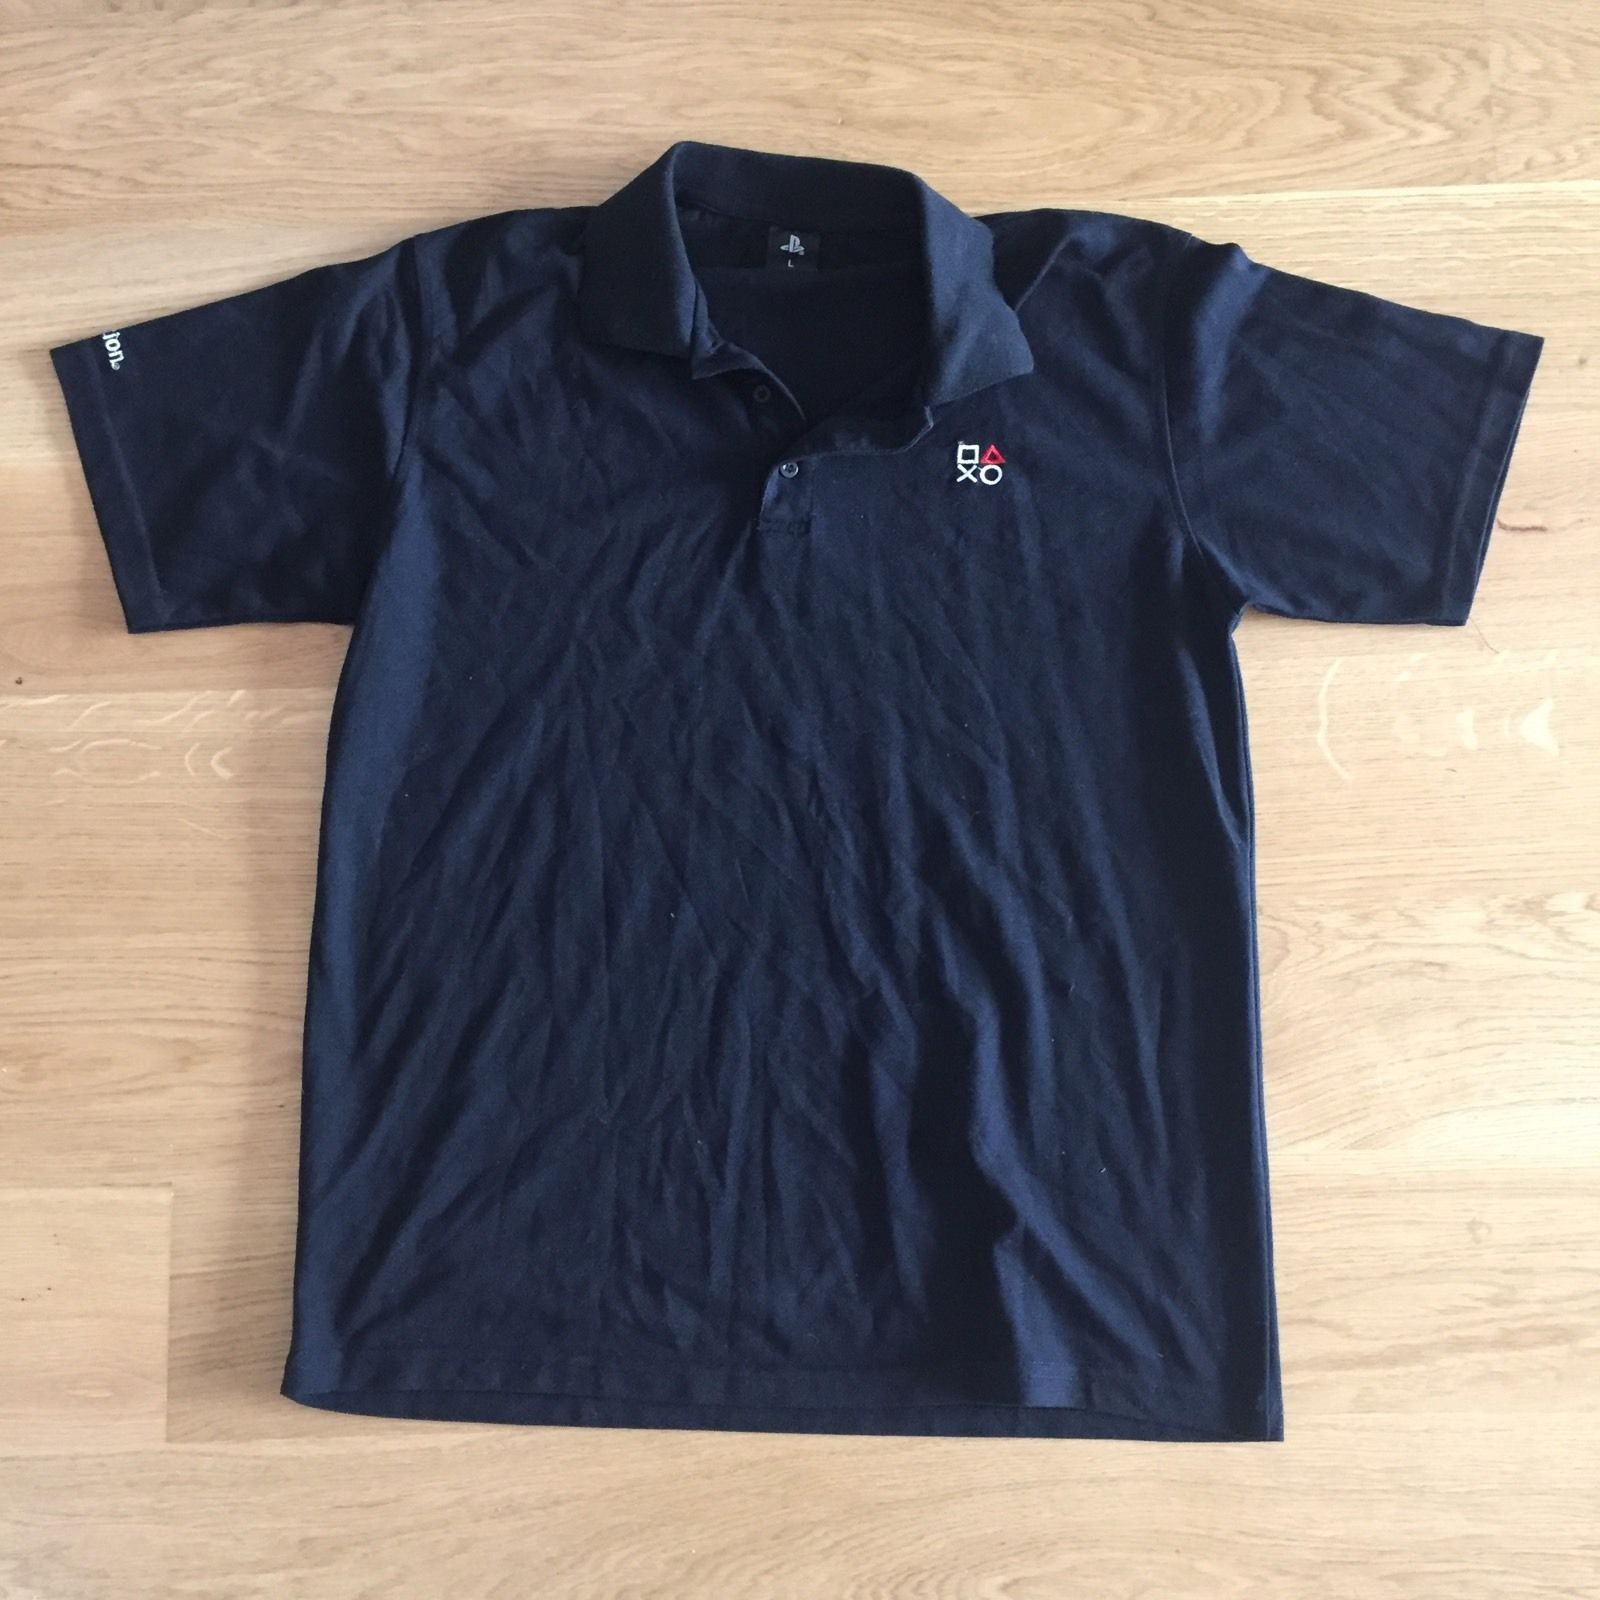 Black t shirt ebay - Playstation Polo Shirt Black Size L Retail Merchandise Vintage Ebay